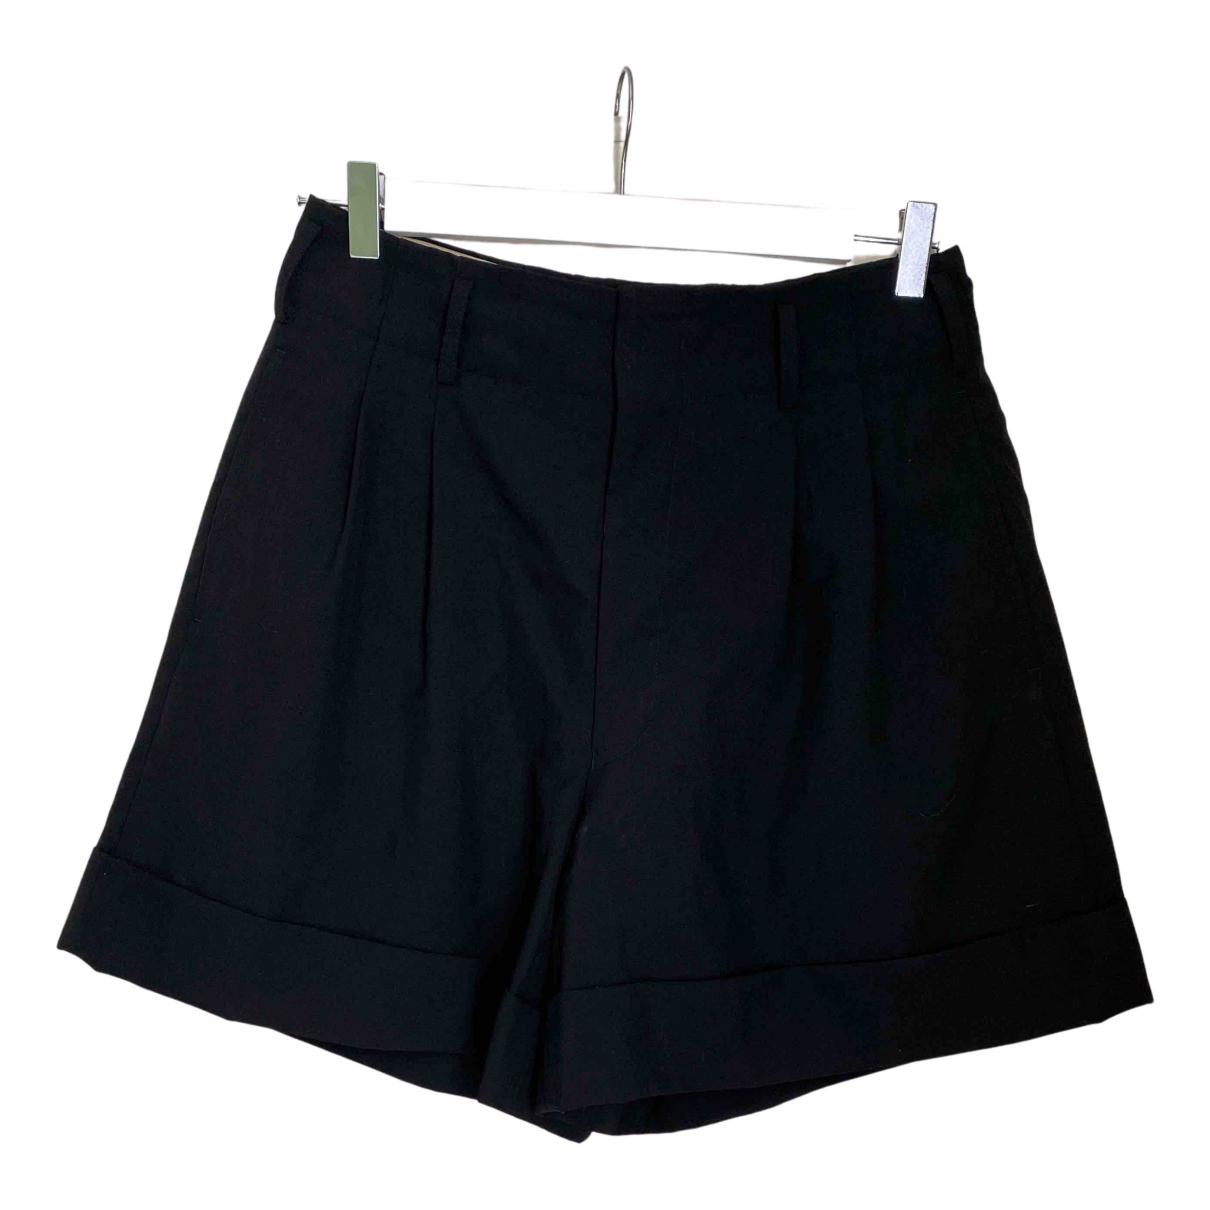 Comme Des Garcons \N Shorts in  Schwarz Wolle